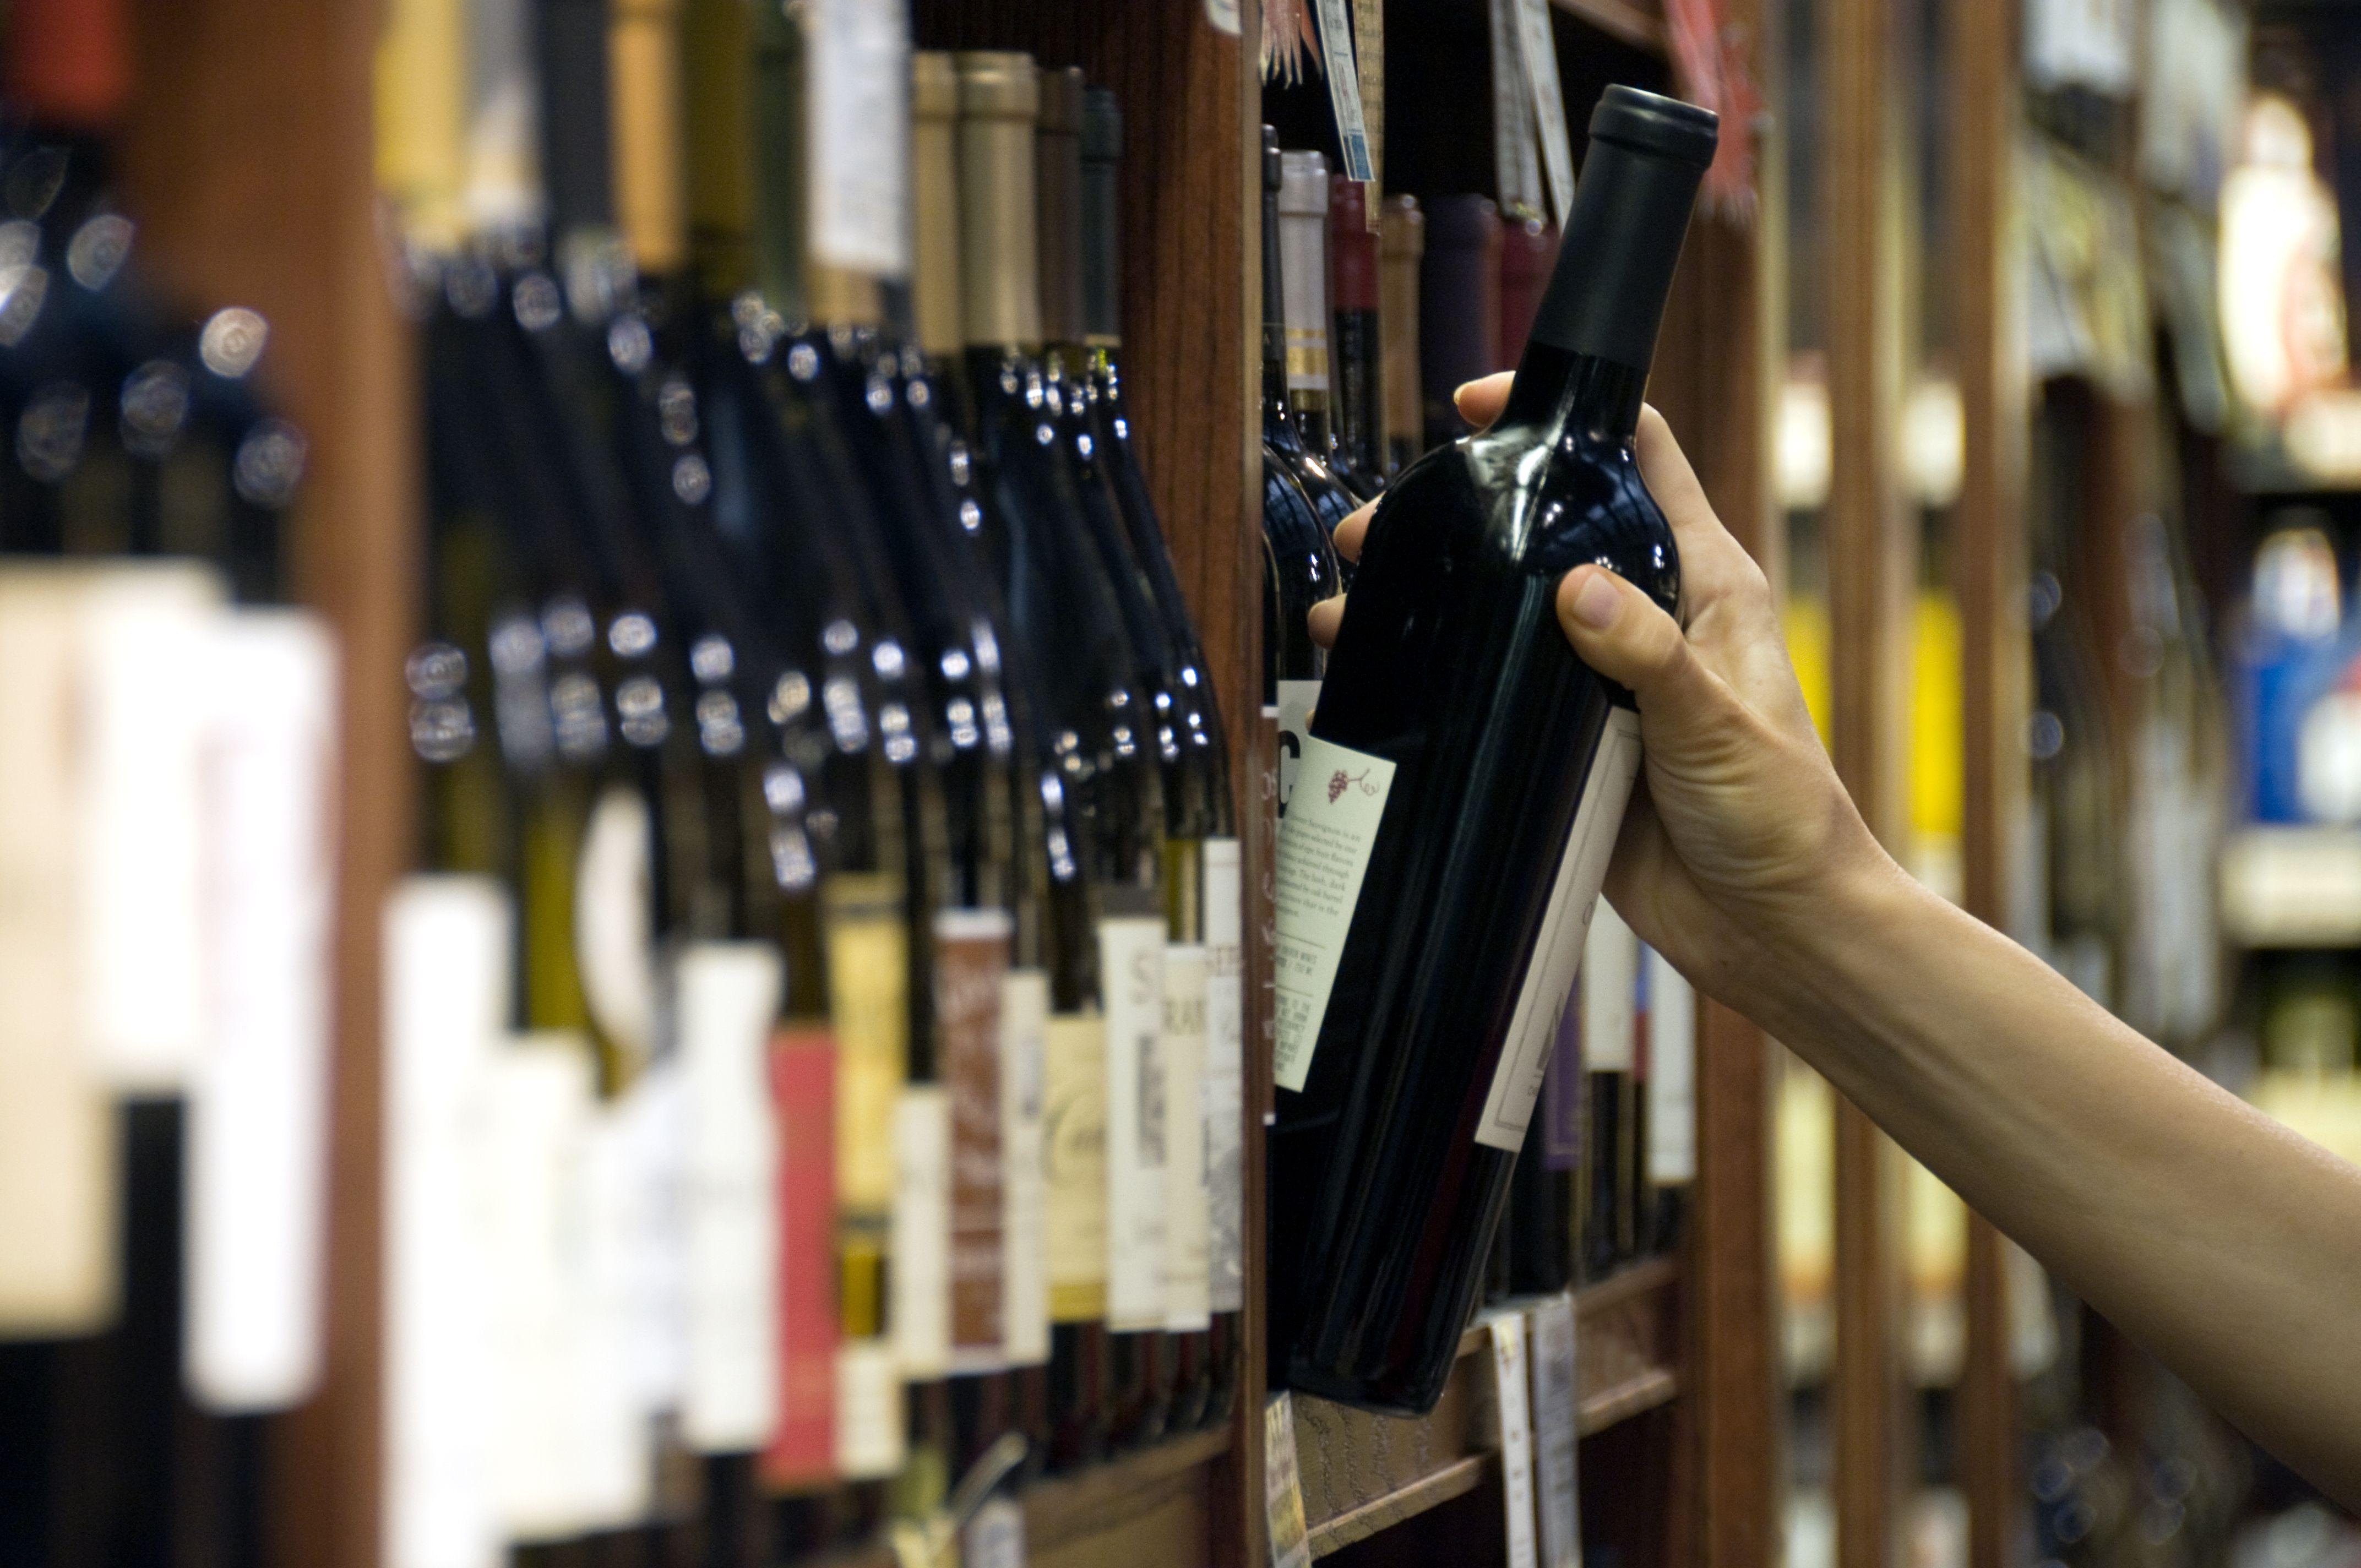 Carta de vinos: Carta de La Bodega Mesón Restaurante